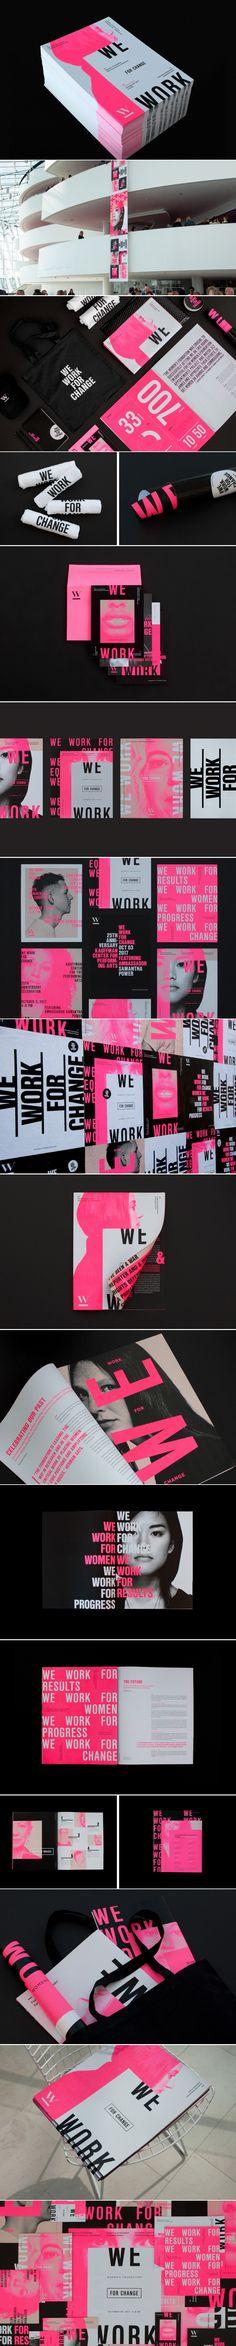 Women's Foundation 25th anniversary campaign branding by Morgan Stephens | Fivestar Branding Agency – Design and Branding Agency & Curated Inspiration Gallery  #women #branding #printdesign #identity #design #behance #dribbble #pinterest #fivestarbranding